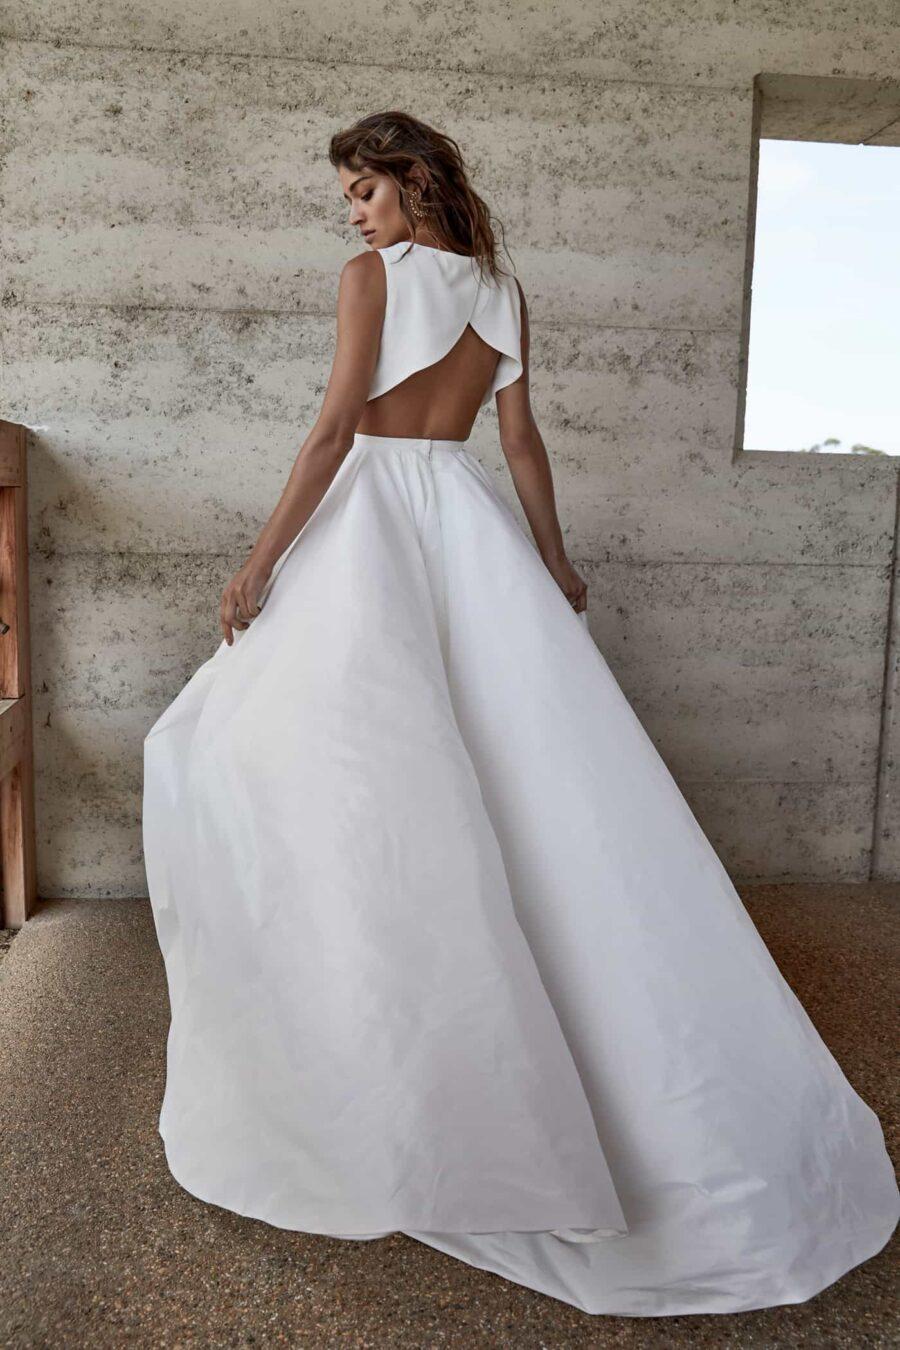 modern two-piece wedding dress with crop top